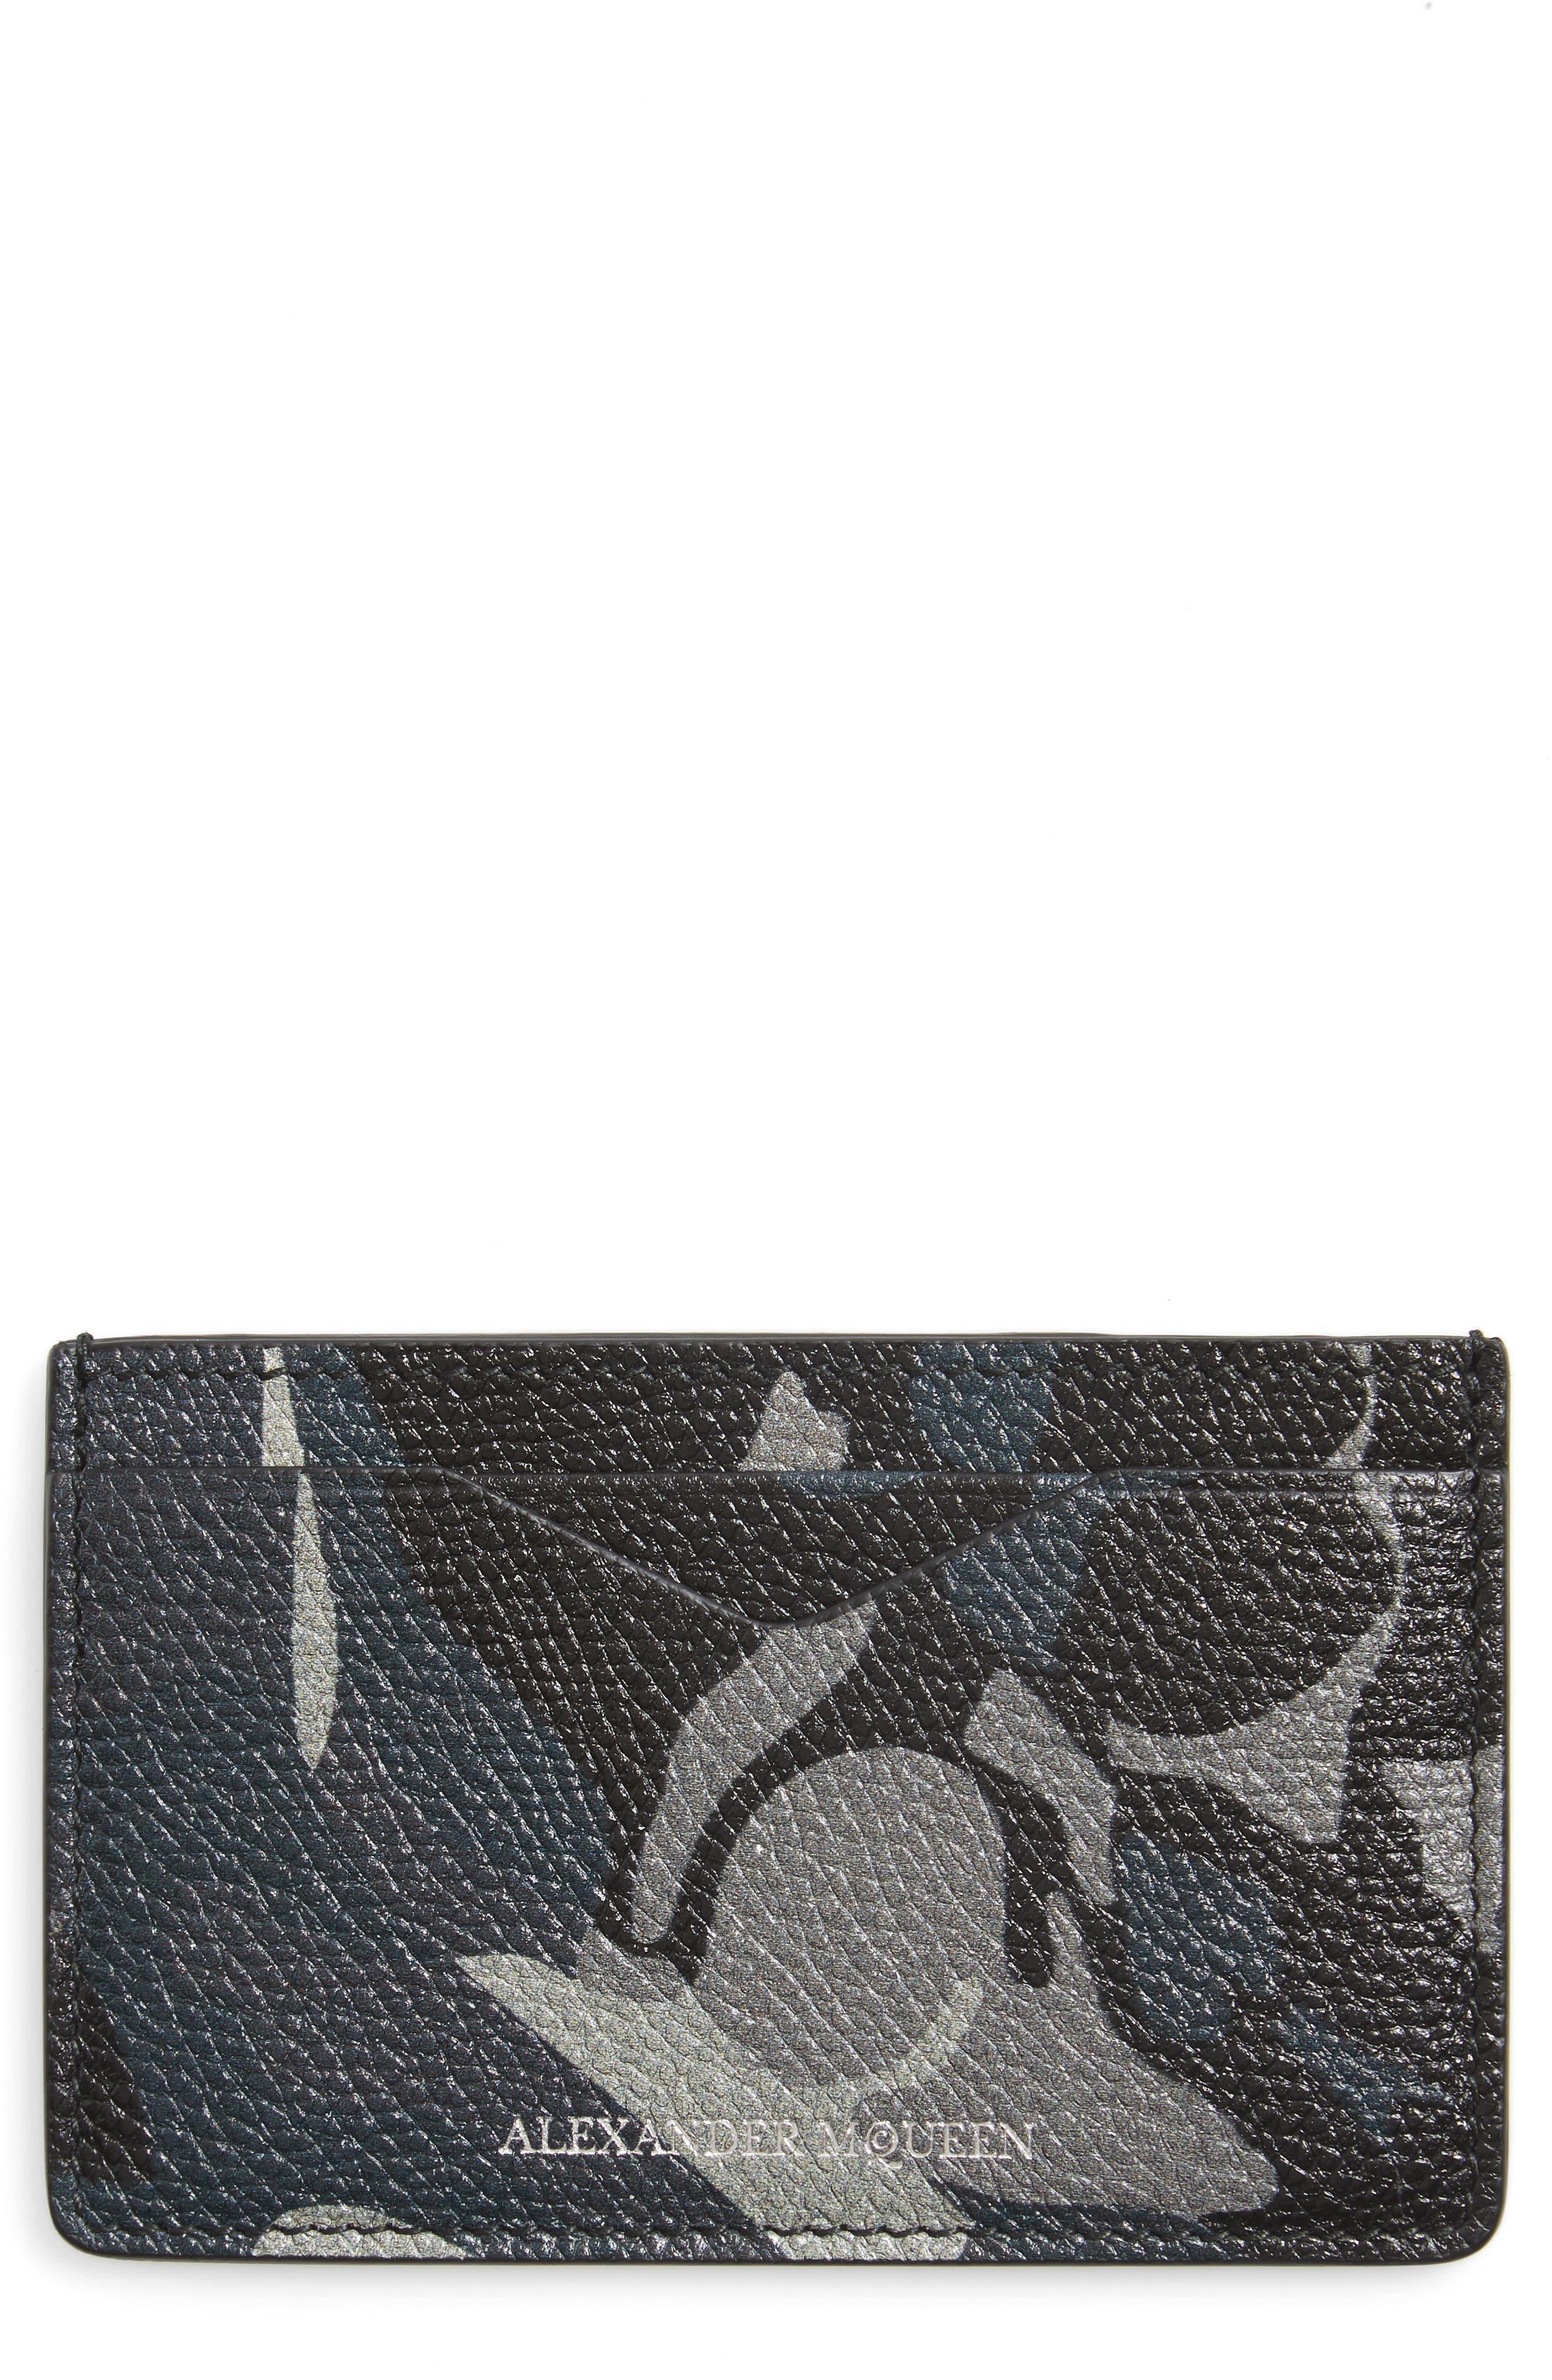 Alternate Image 1 Selected - Alexander McQueen Camo Leather Card Case